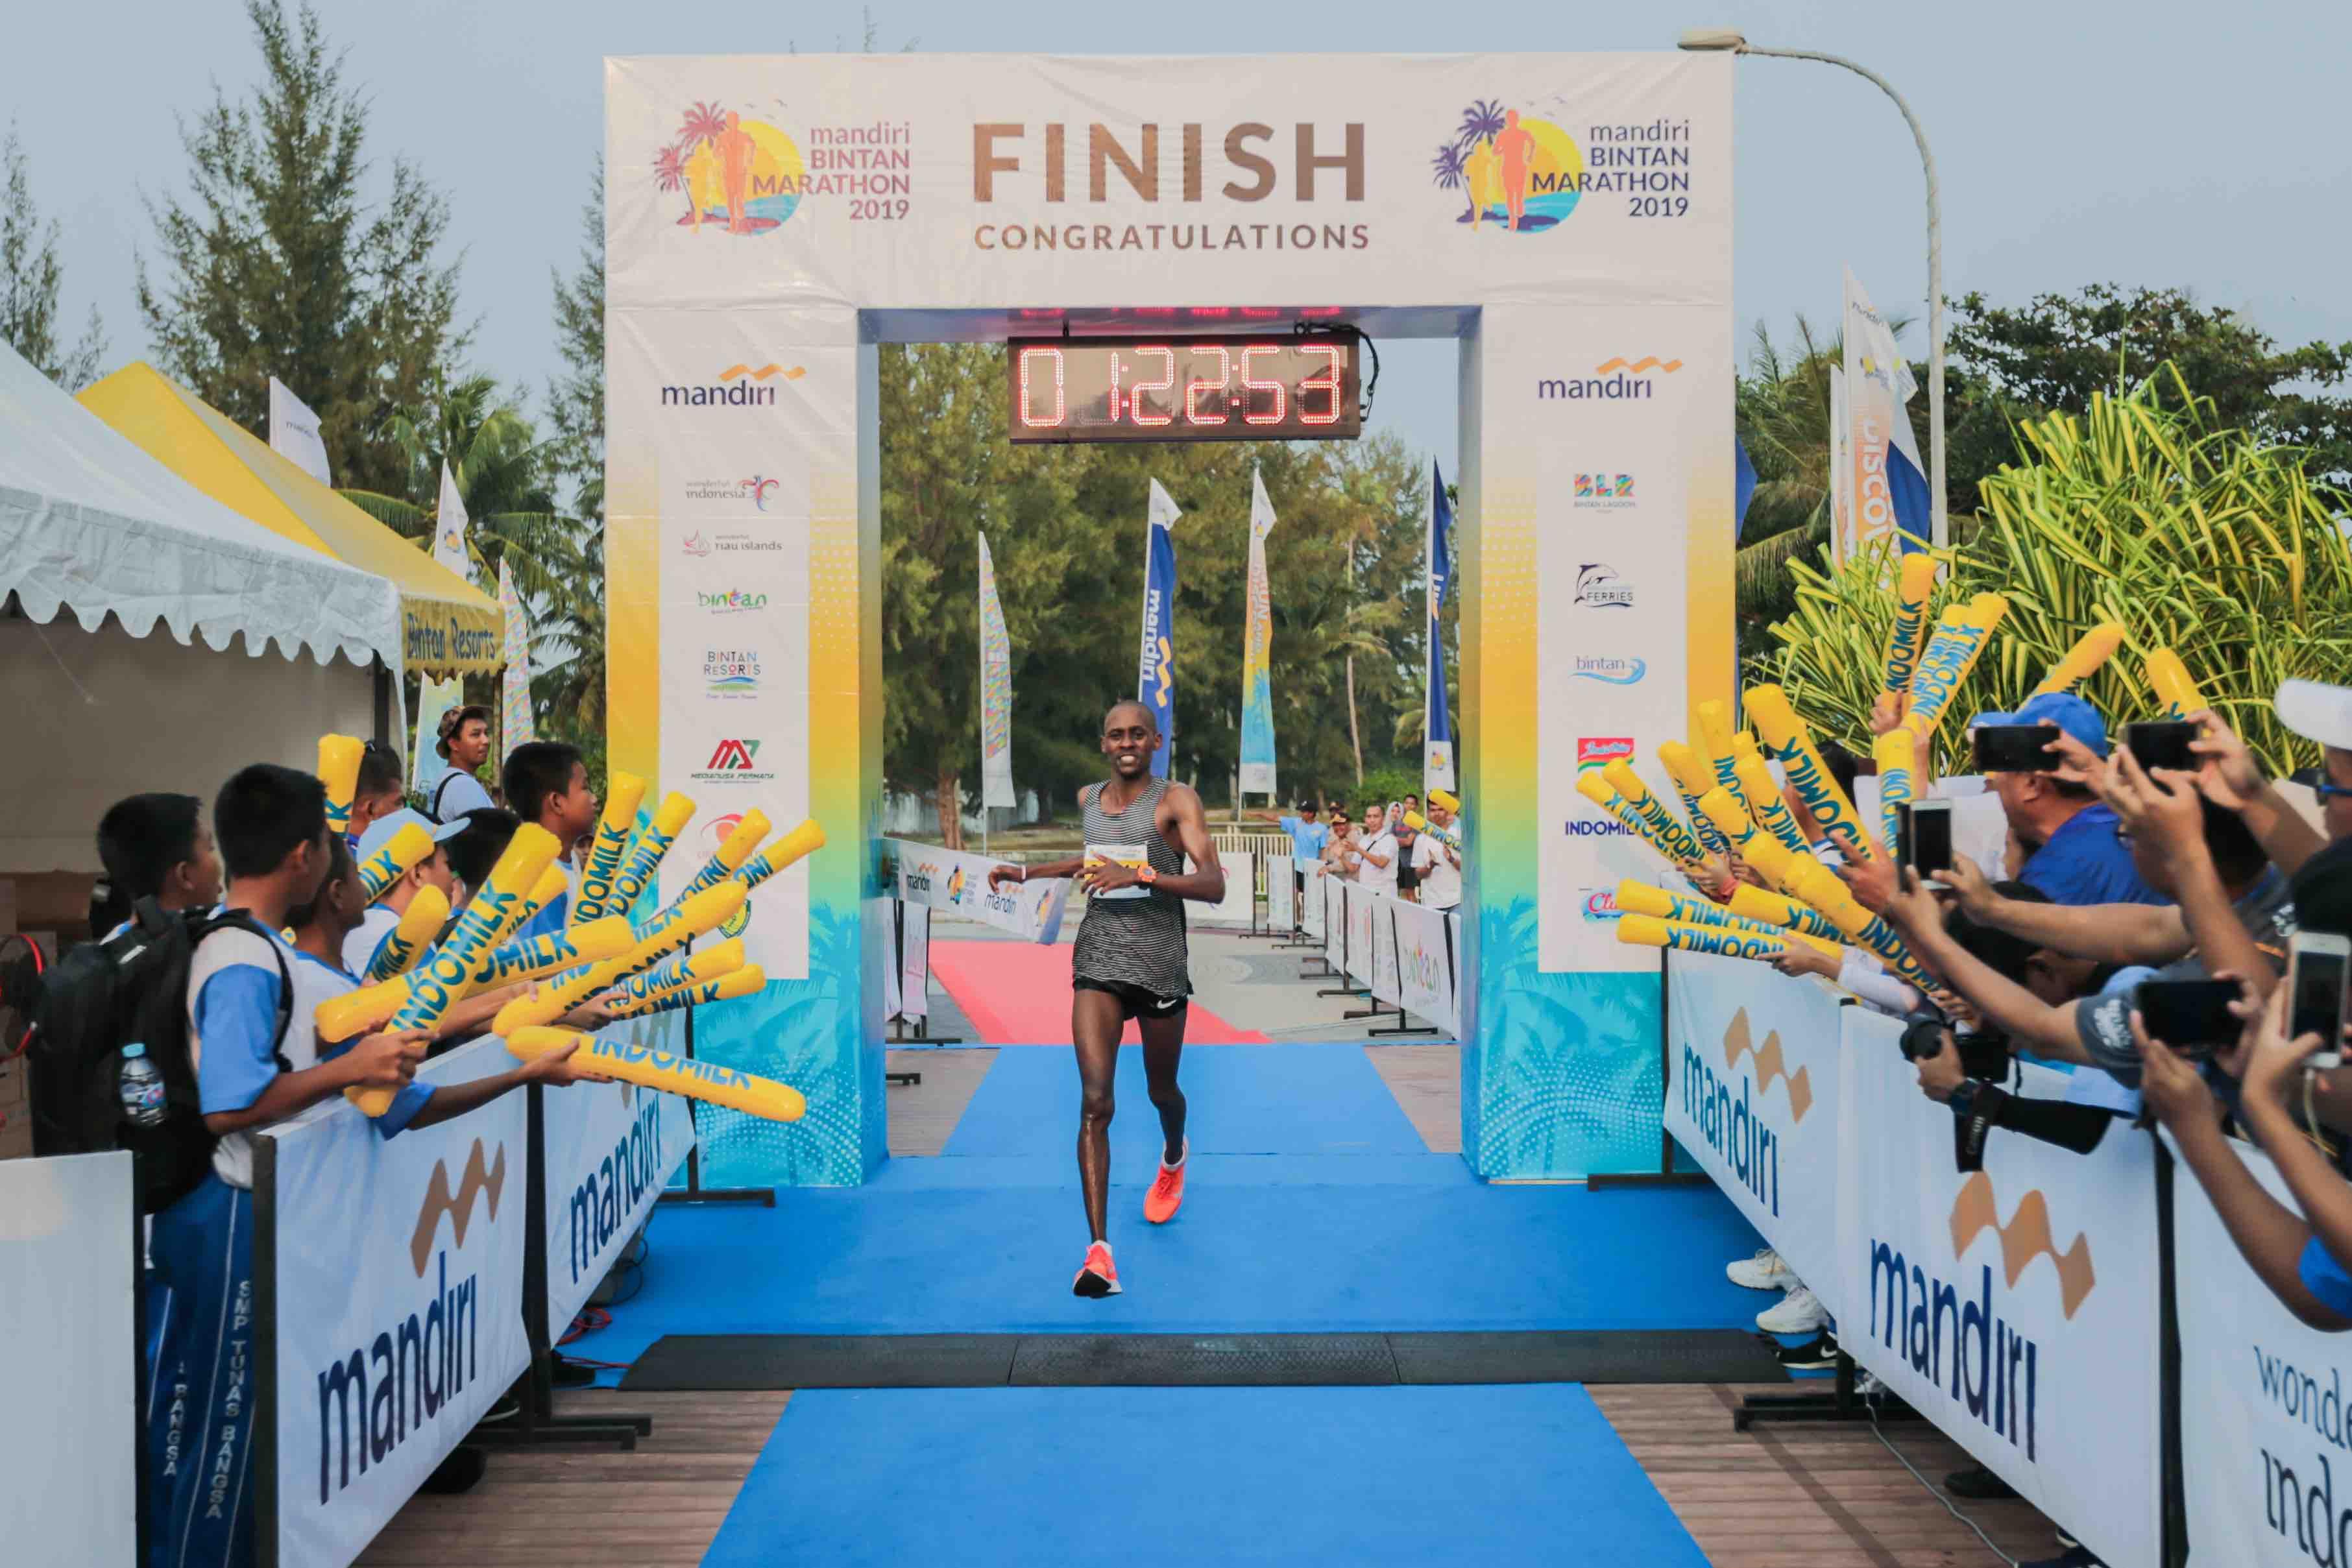 Mathew Samperu, first finisher of the 21km Half Marathon clocked an impressive timing of 01:08:12.6